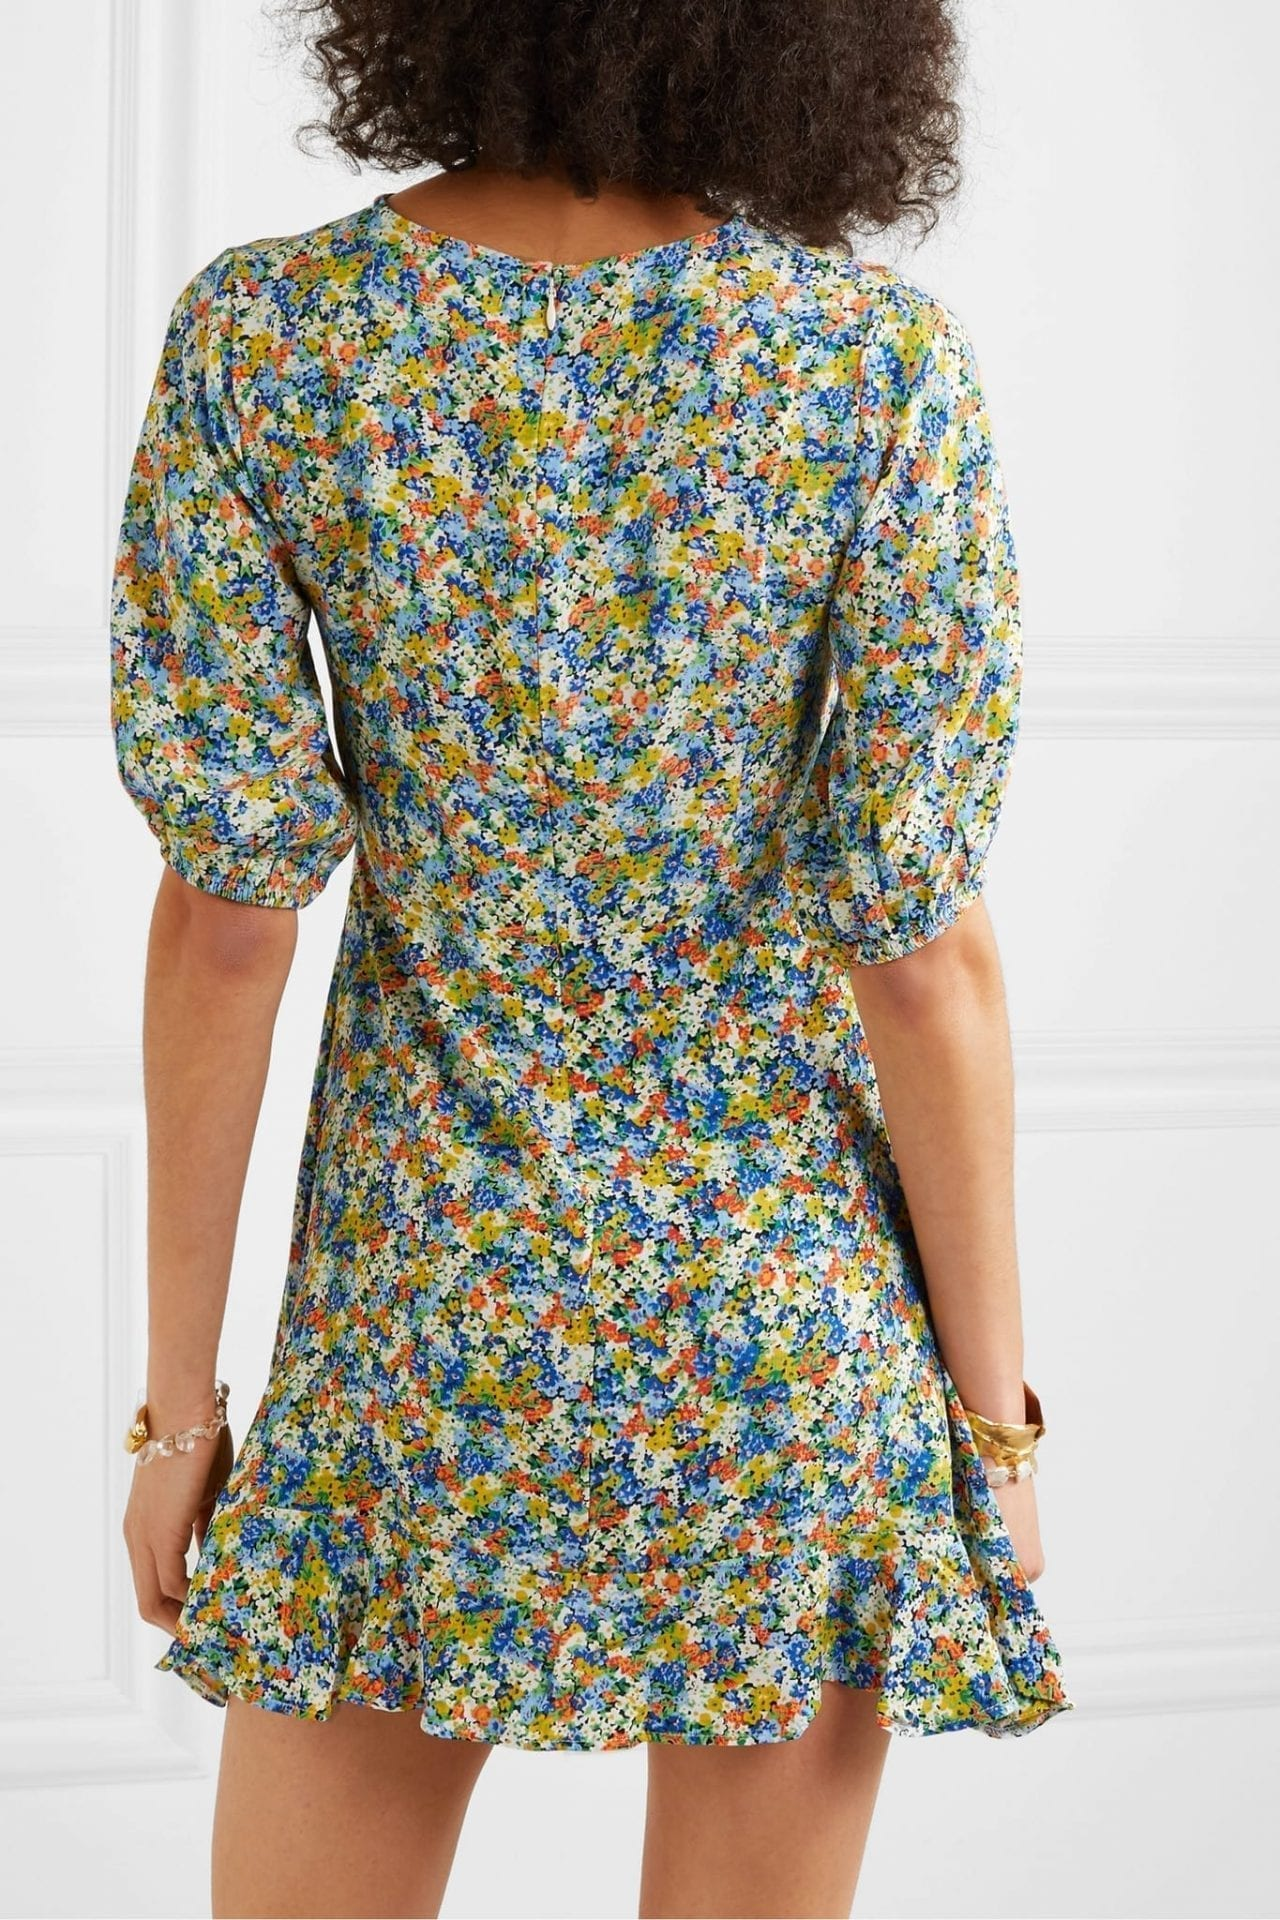 FAITHFULL THE BRAND Jeanette Floral-print Crepe Mini Dress